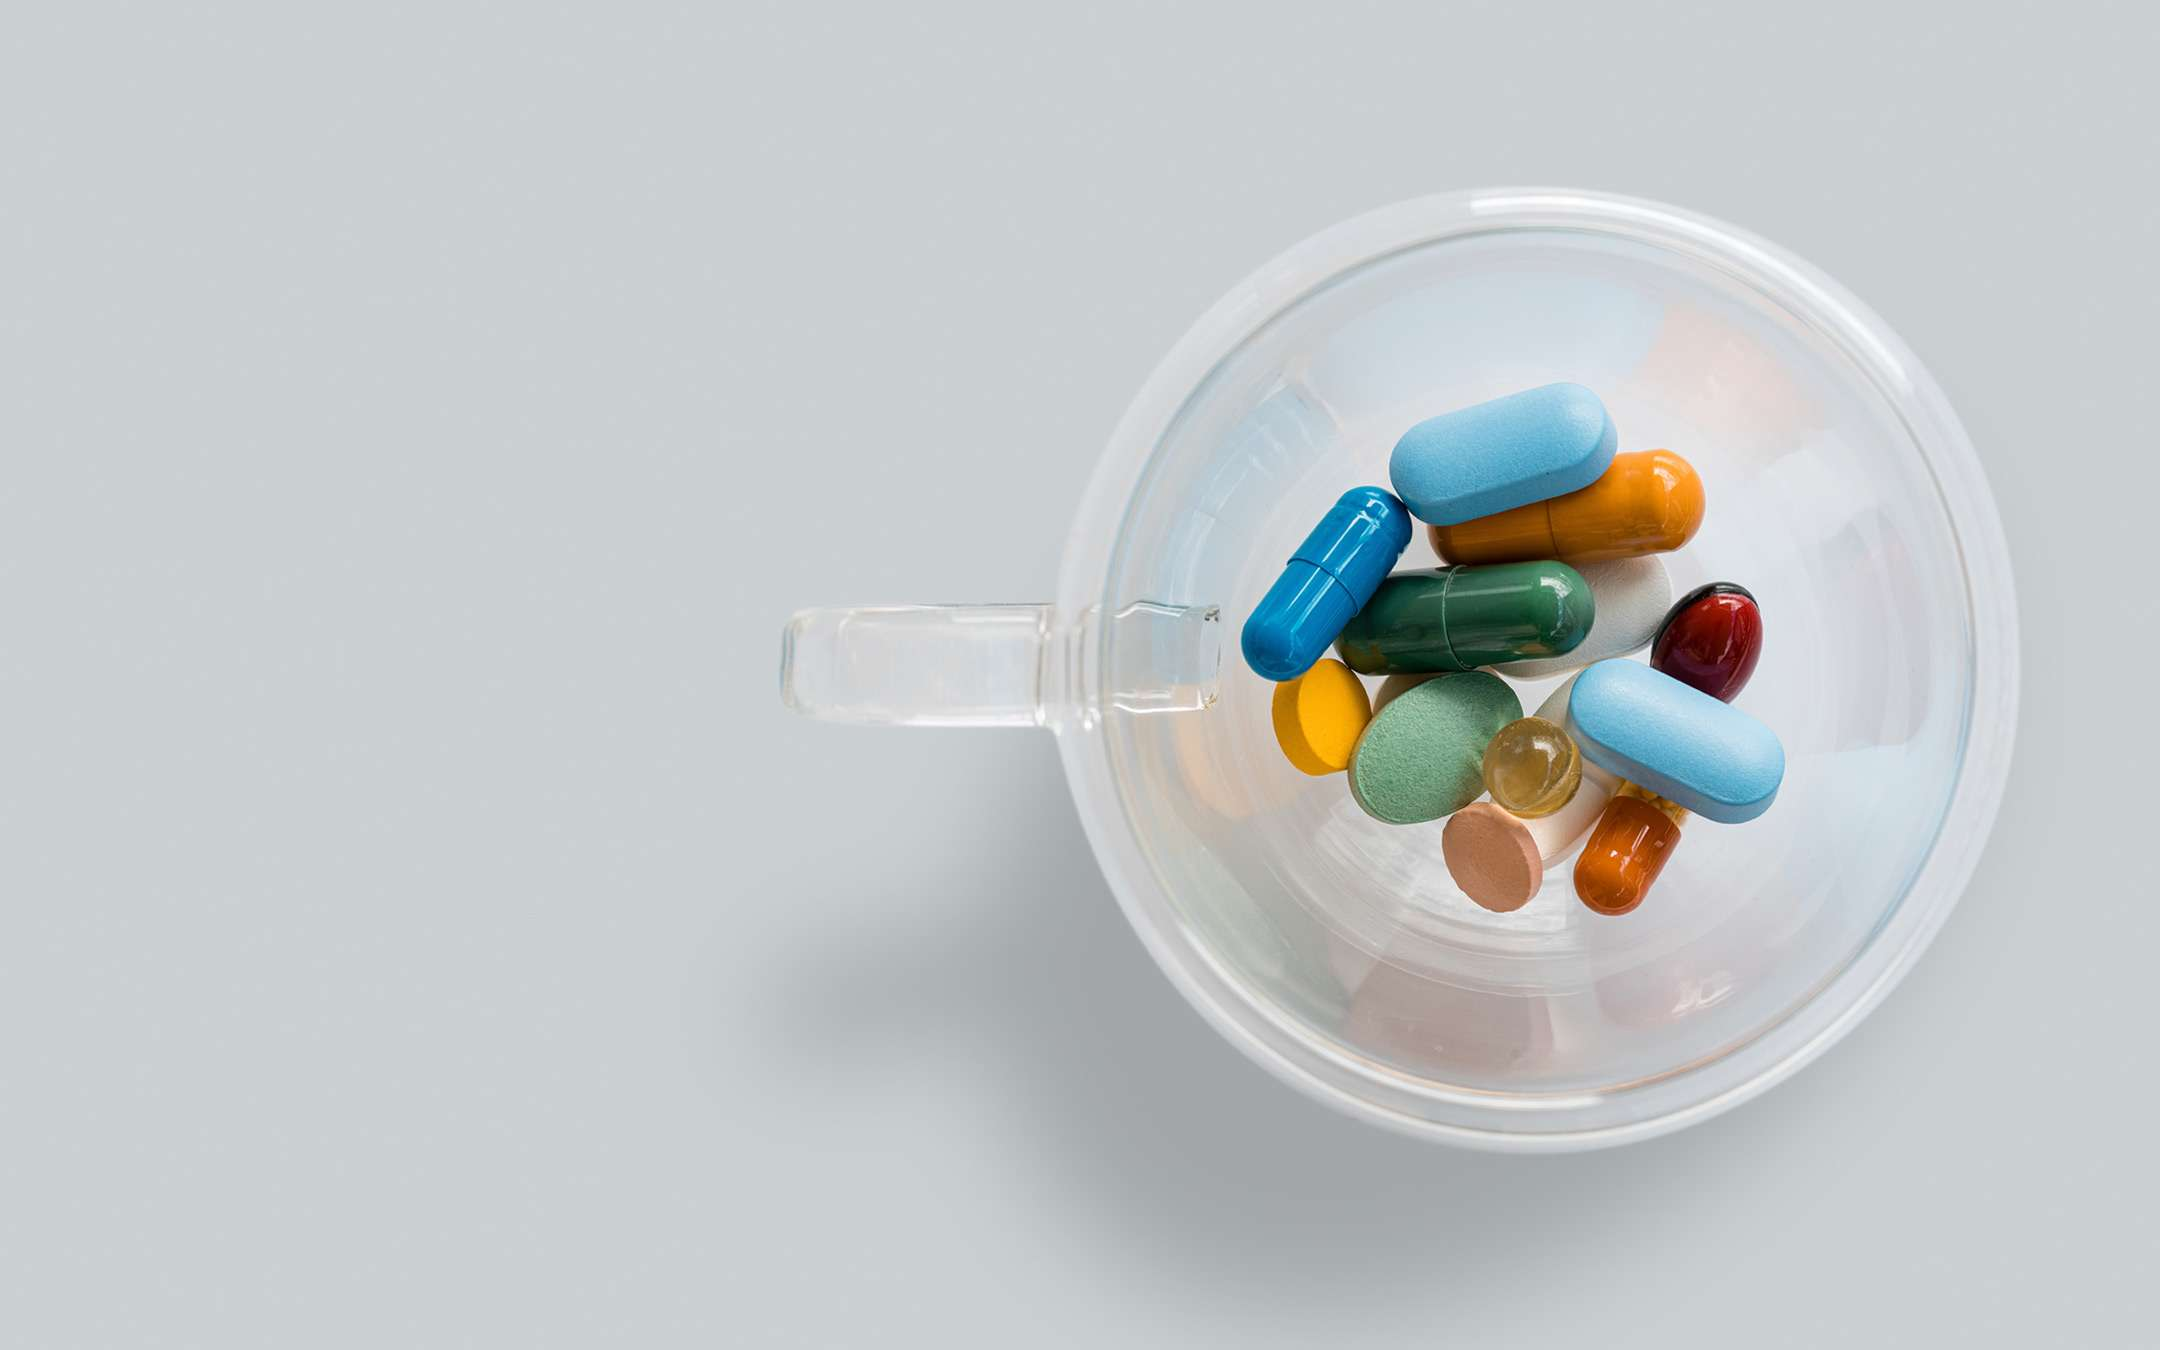 Amazon Pharmacy: Bezos in the drug business